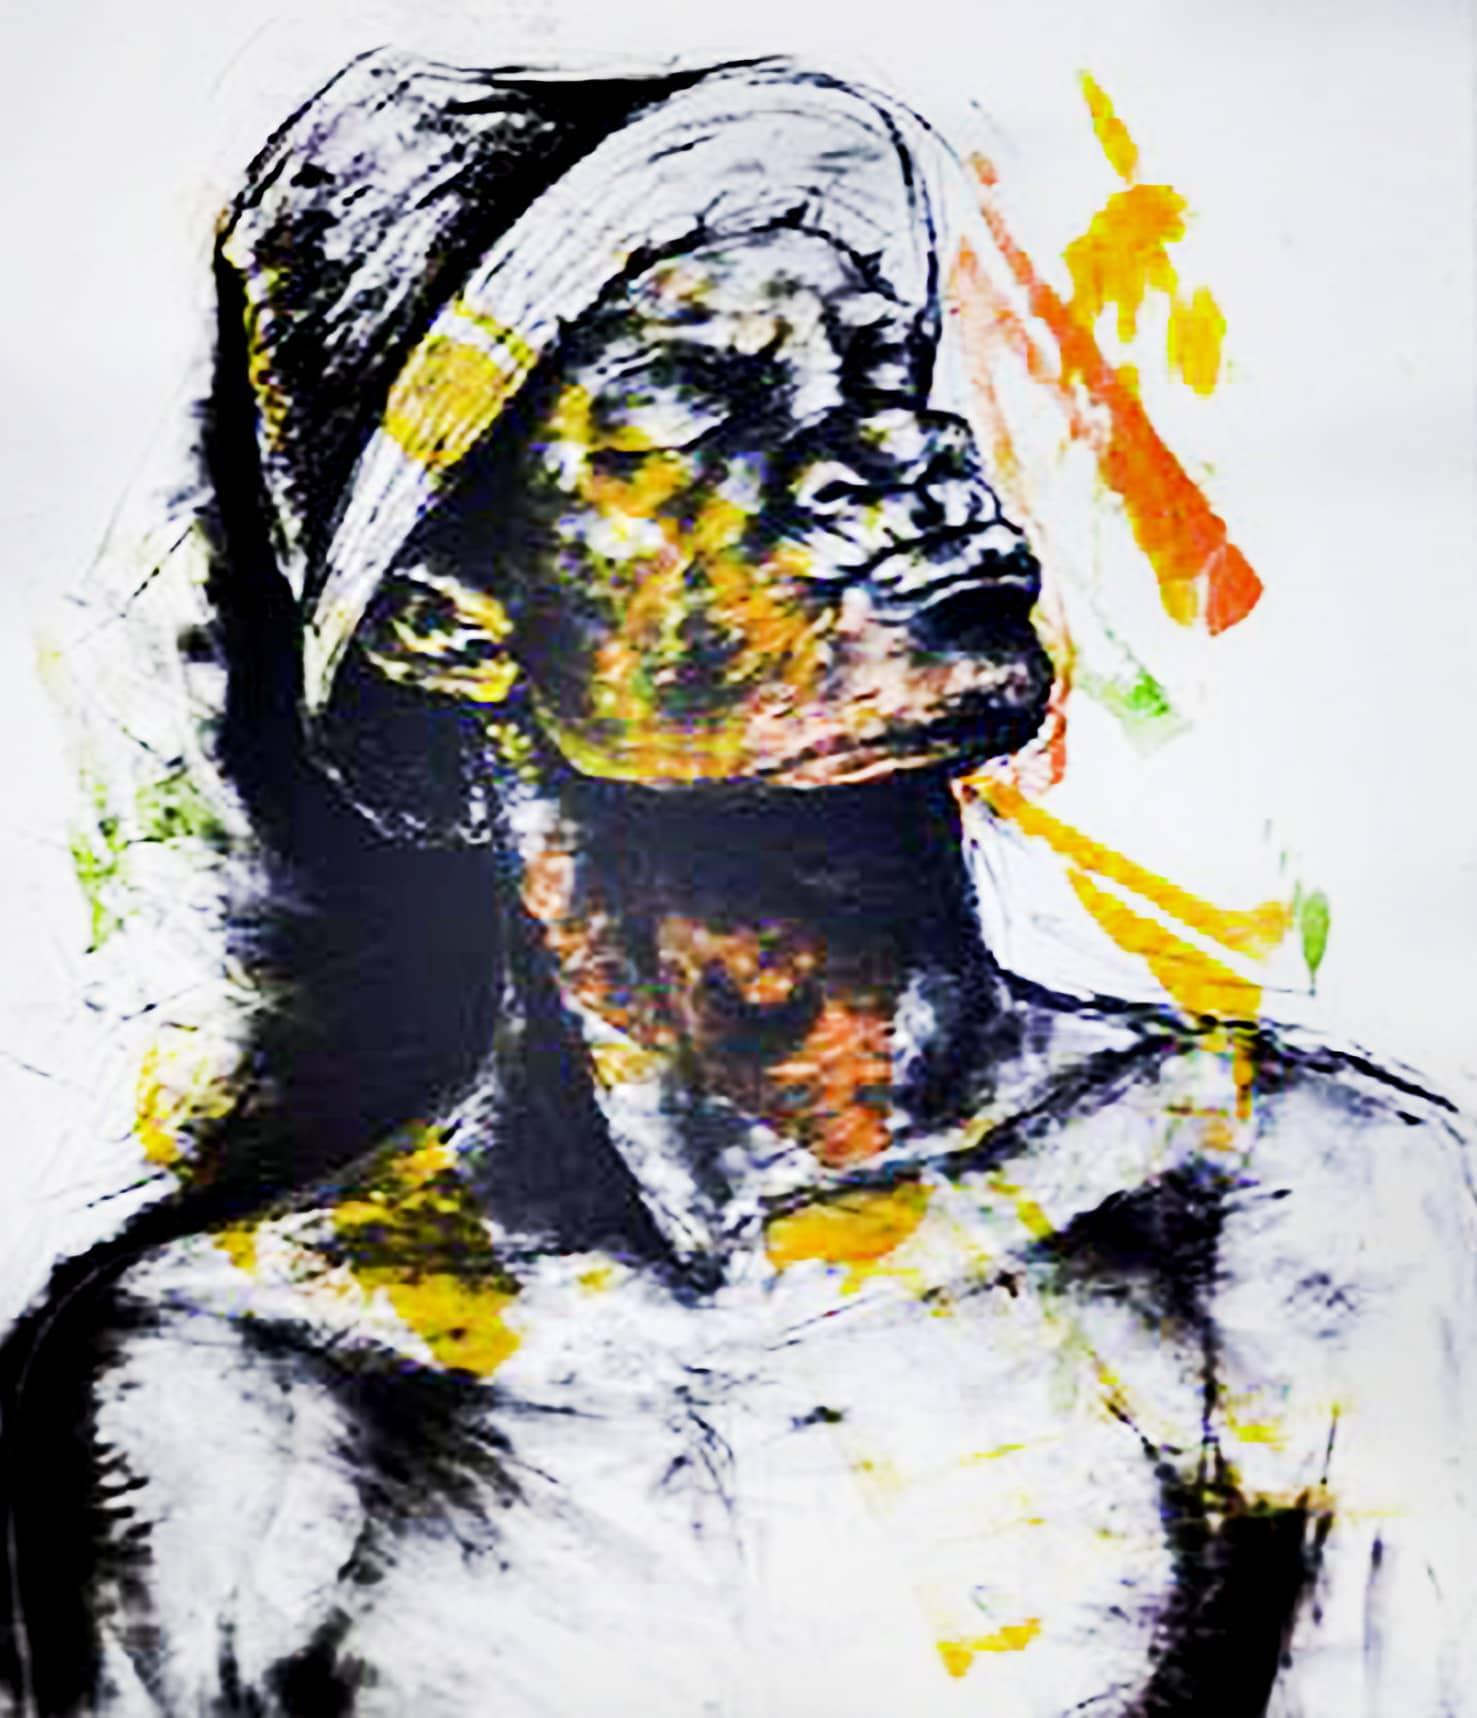 <span class=&#34;link fancybox-details-link&#34;><a href=&#34;/artworks/categories/121/3156-mlamuli-mkhwanazi-soke-sizwe-2015/&#34;>View Detail Page</a></span><div class=&#34;artist&#34;><strong>Mlamuli Mkhwanazi</strong></div> <div class=&#34;title&#34;><em>Soke-Sizwe</em>, 2015</div> <div class=&#34;medium&#34;>Charcoal & Ink On Paper</div> <div class=&#34;dimensions&#34;>92cm x 83cm</div><div class=&#34;price&#34;>R9,200.00</div>